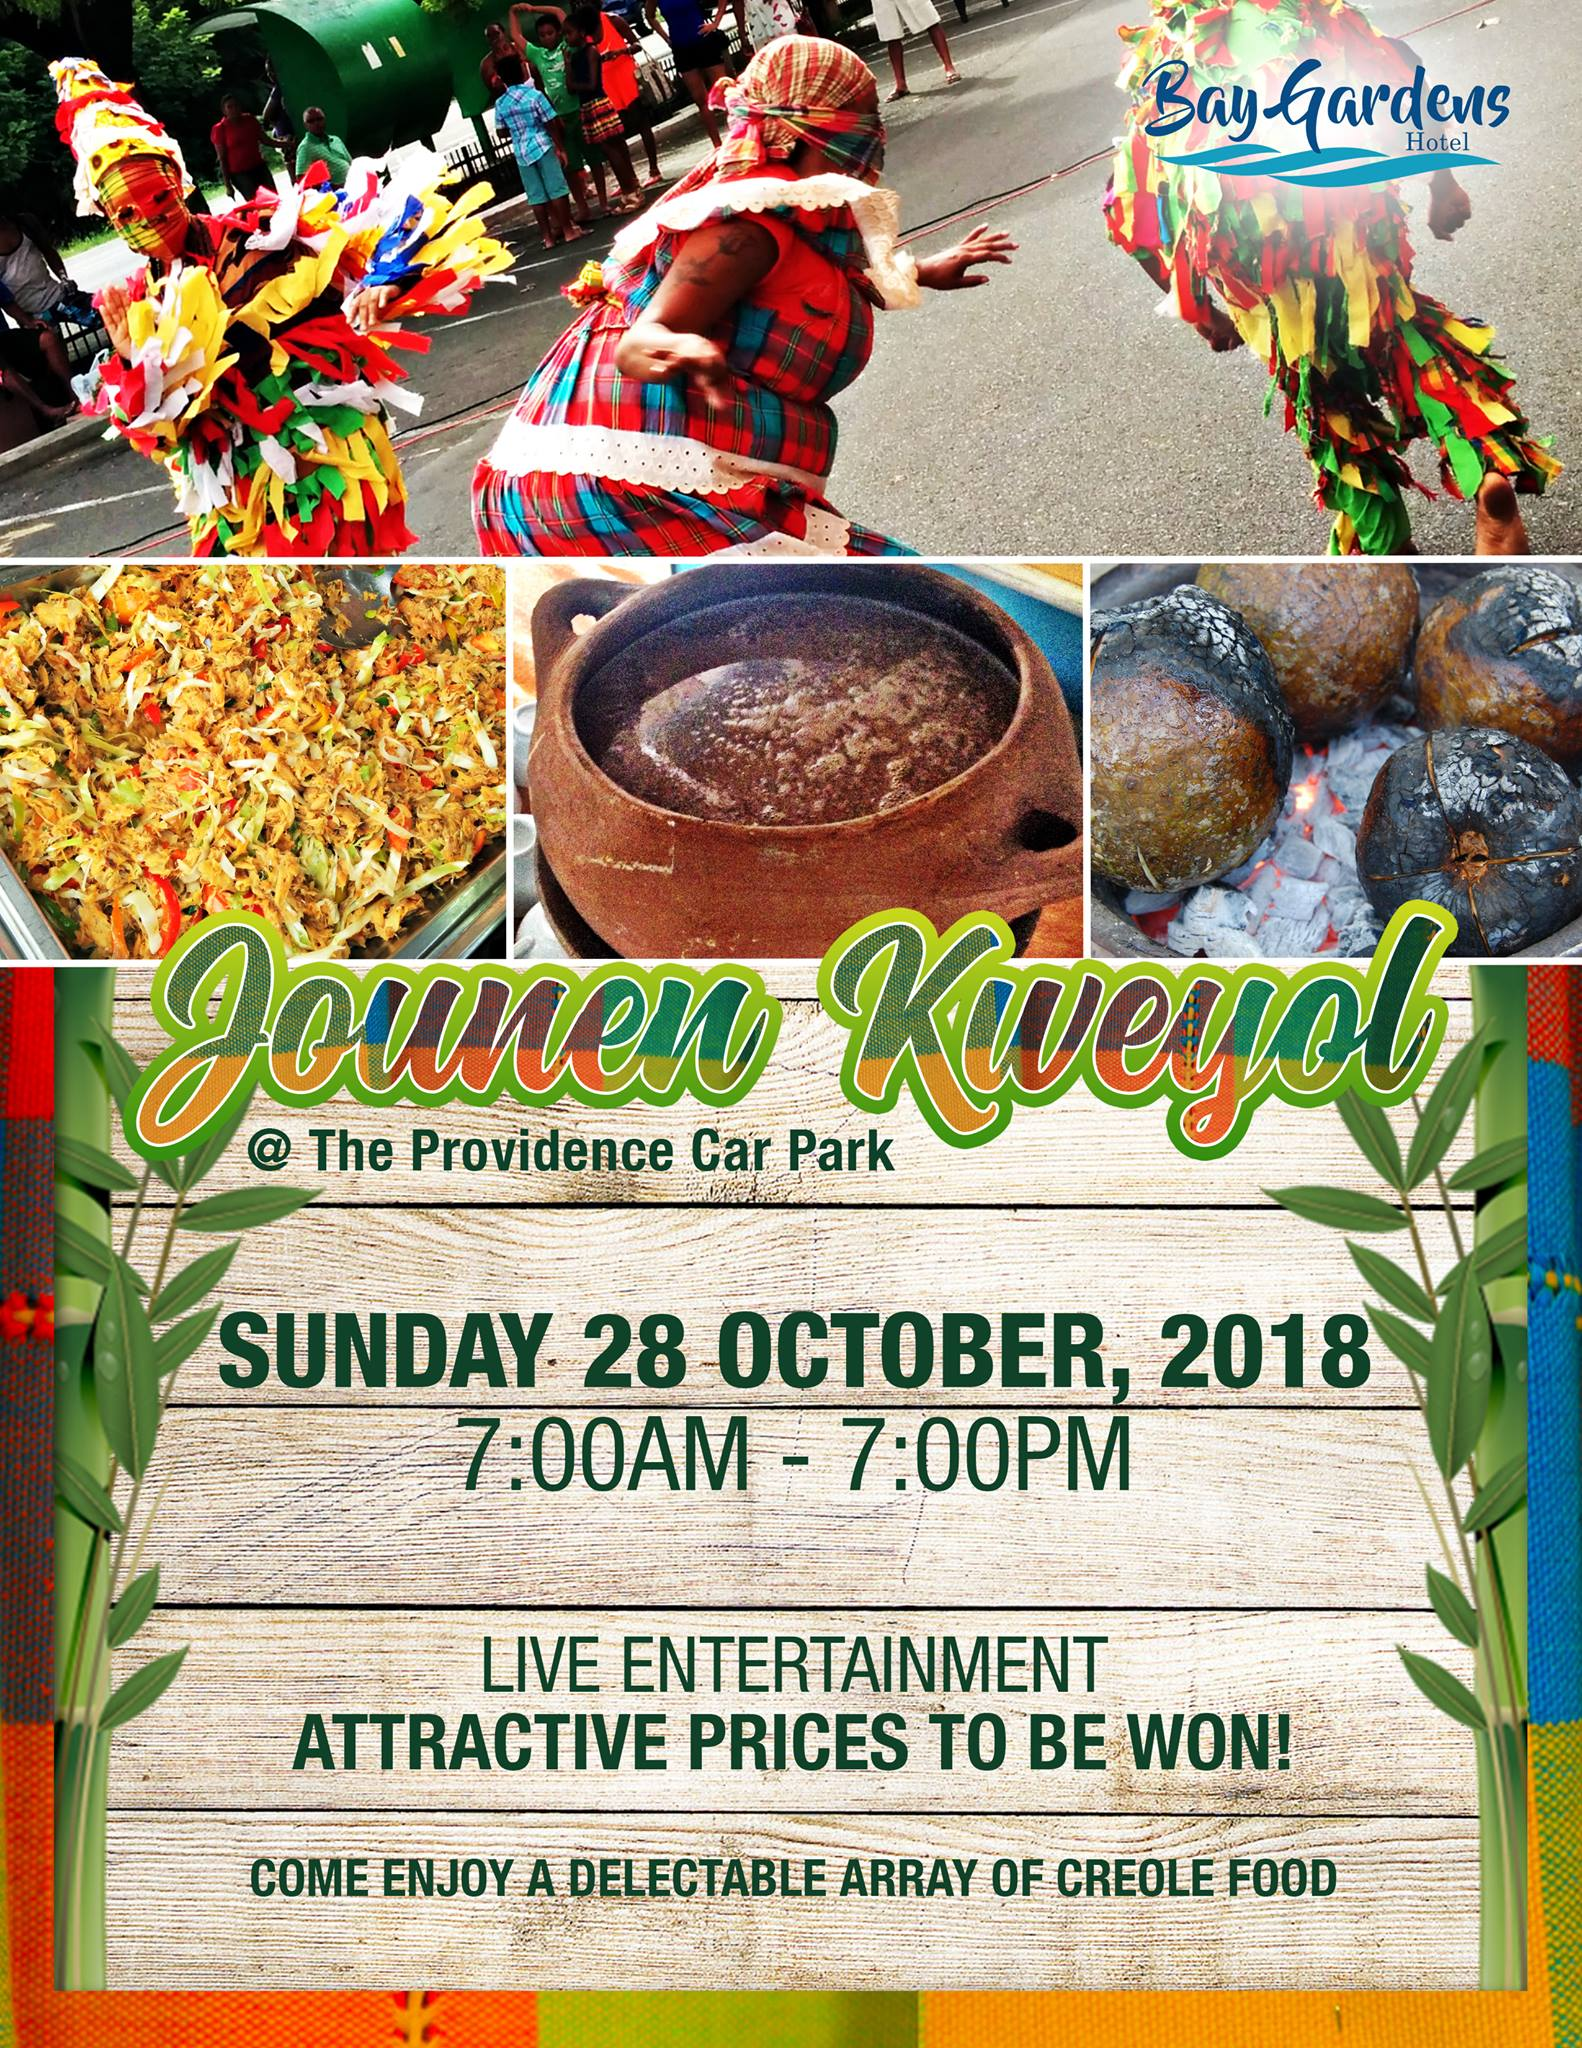 Bay Gardens Resorts Kweyol Jam - all day food, entertainment, Prizes